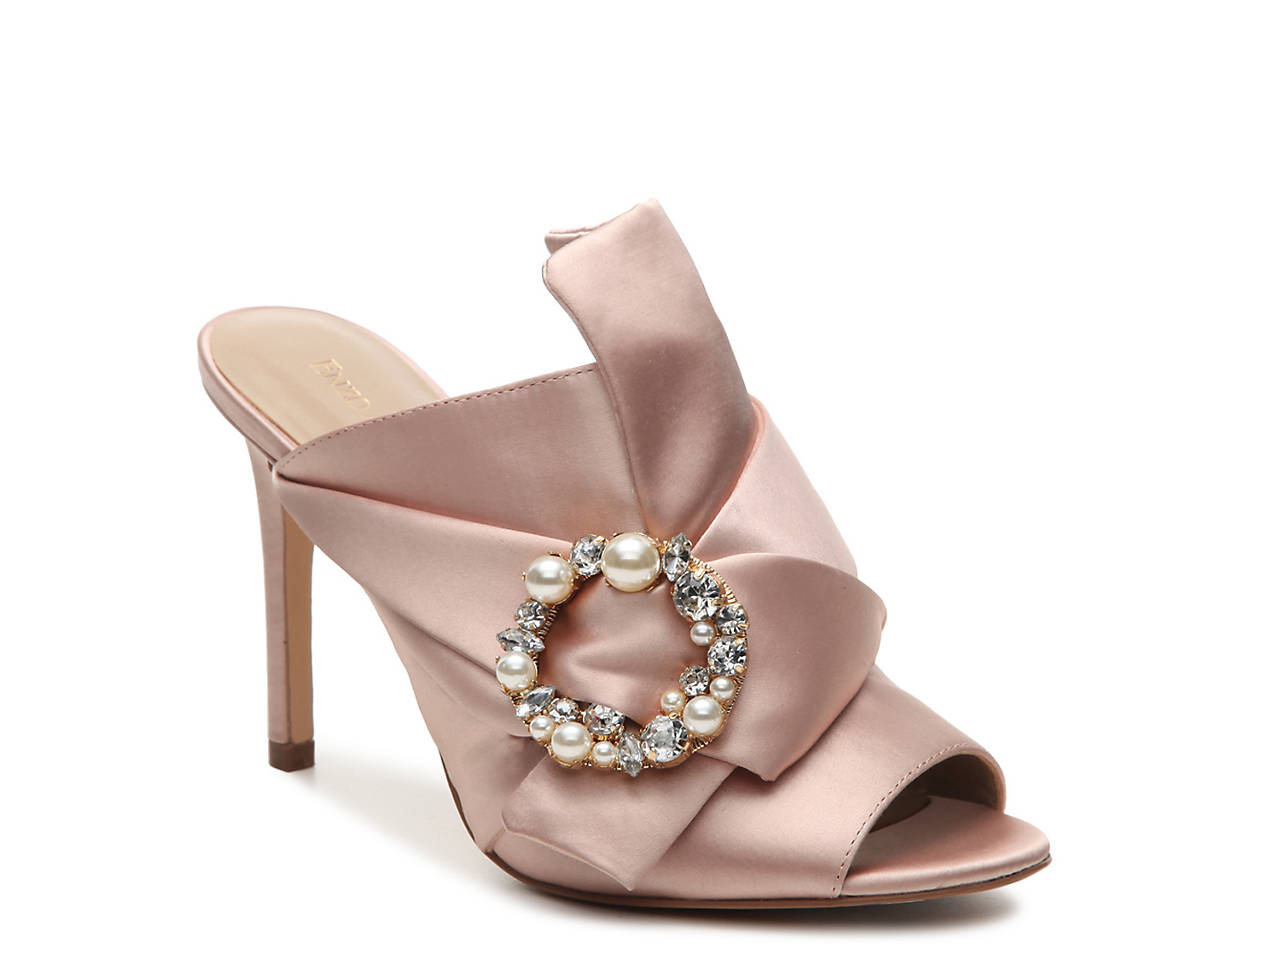 8f946cbdc6f9 Enzo Angiolini Fallyn Sandal Women s Shoes